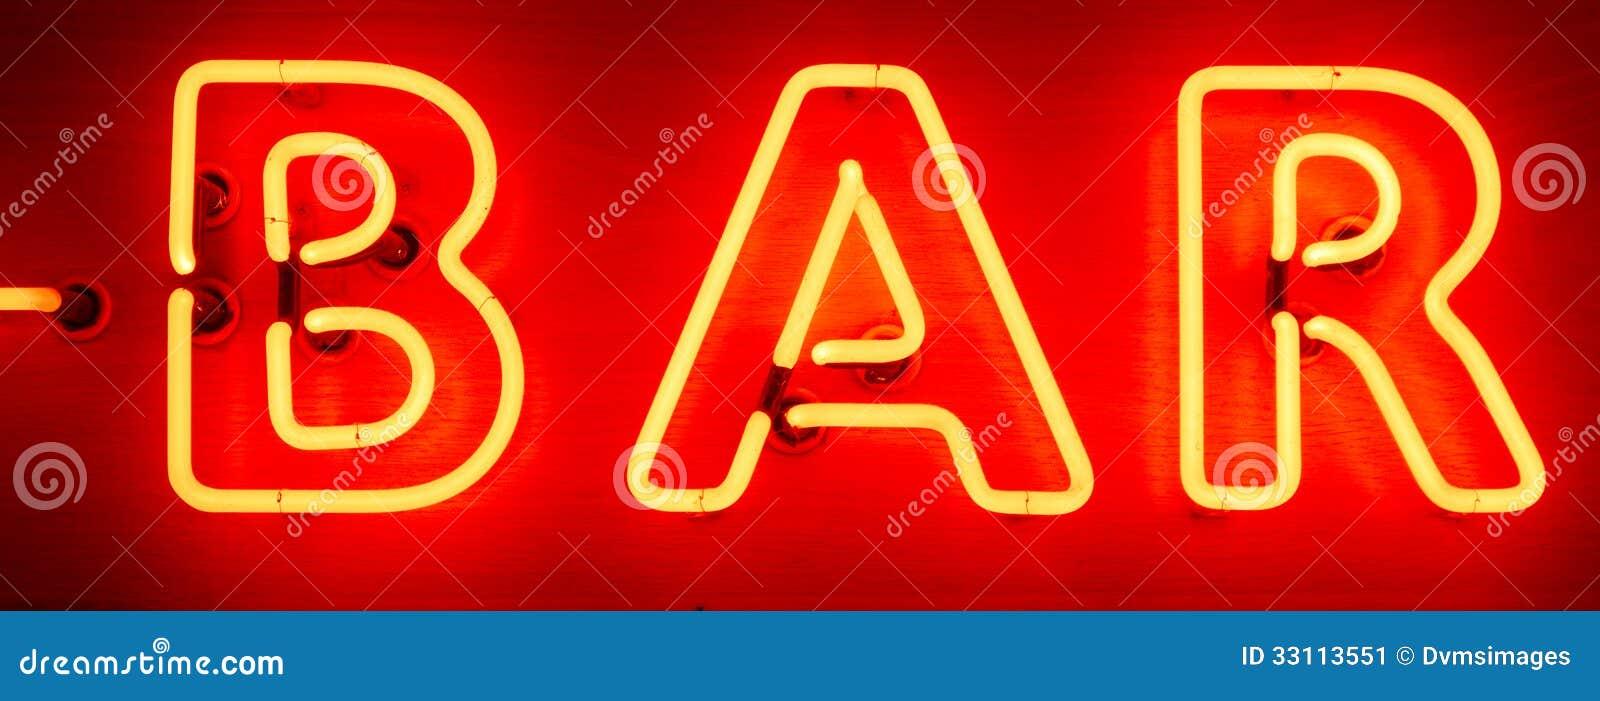 Neon Bar Sign stock image. Image of illuminated, lighting